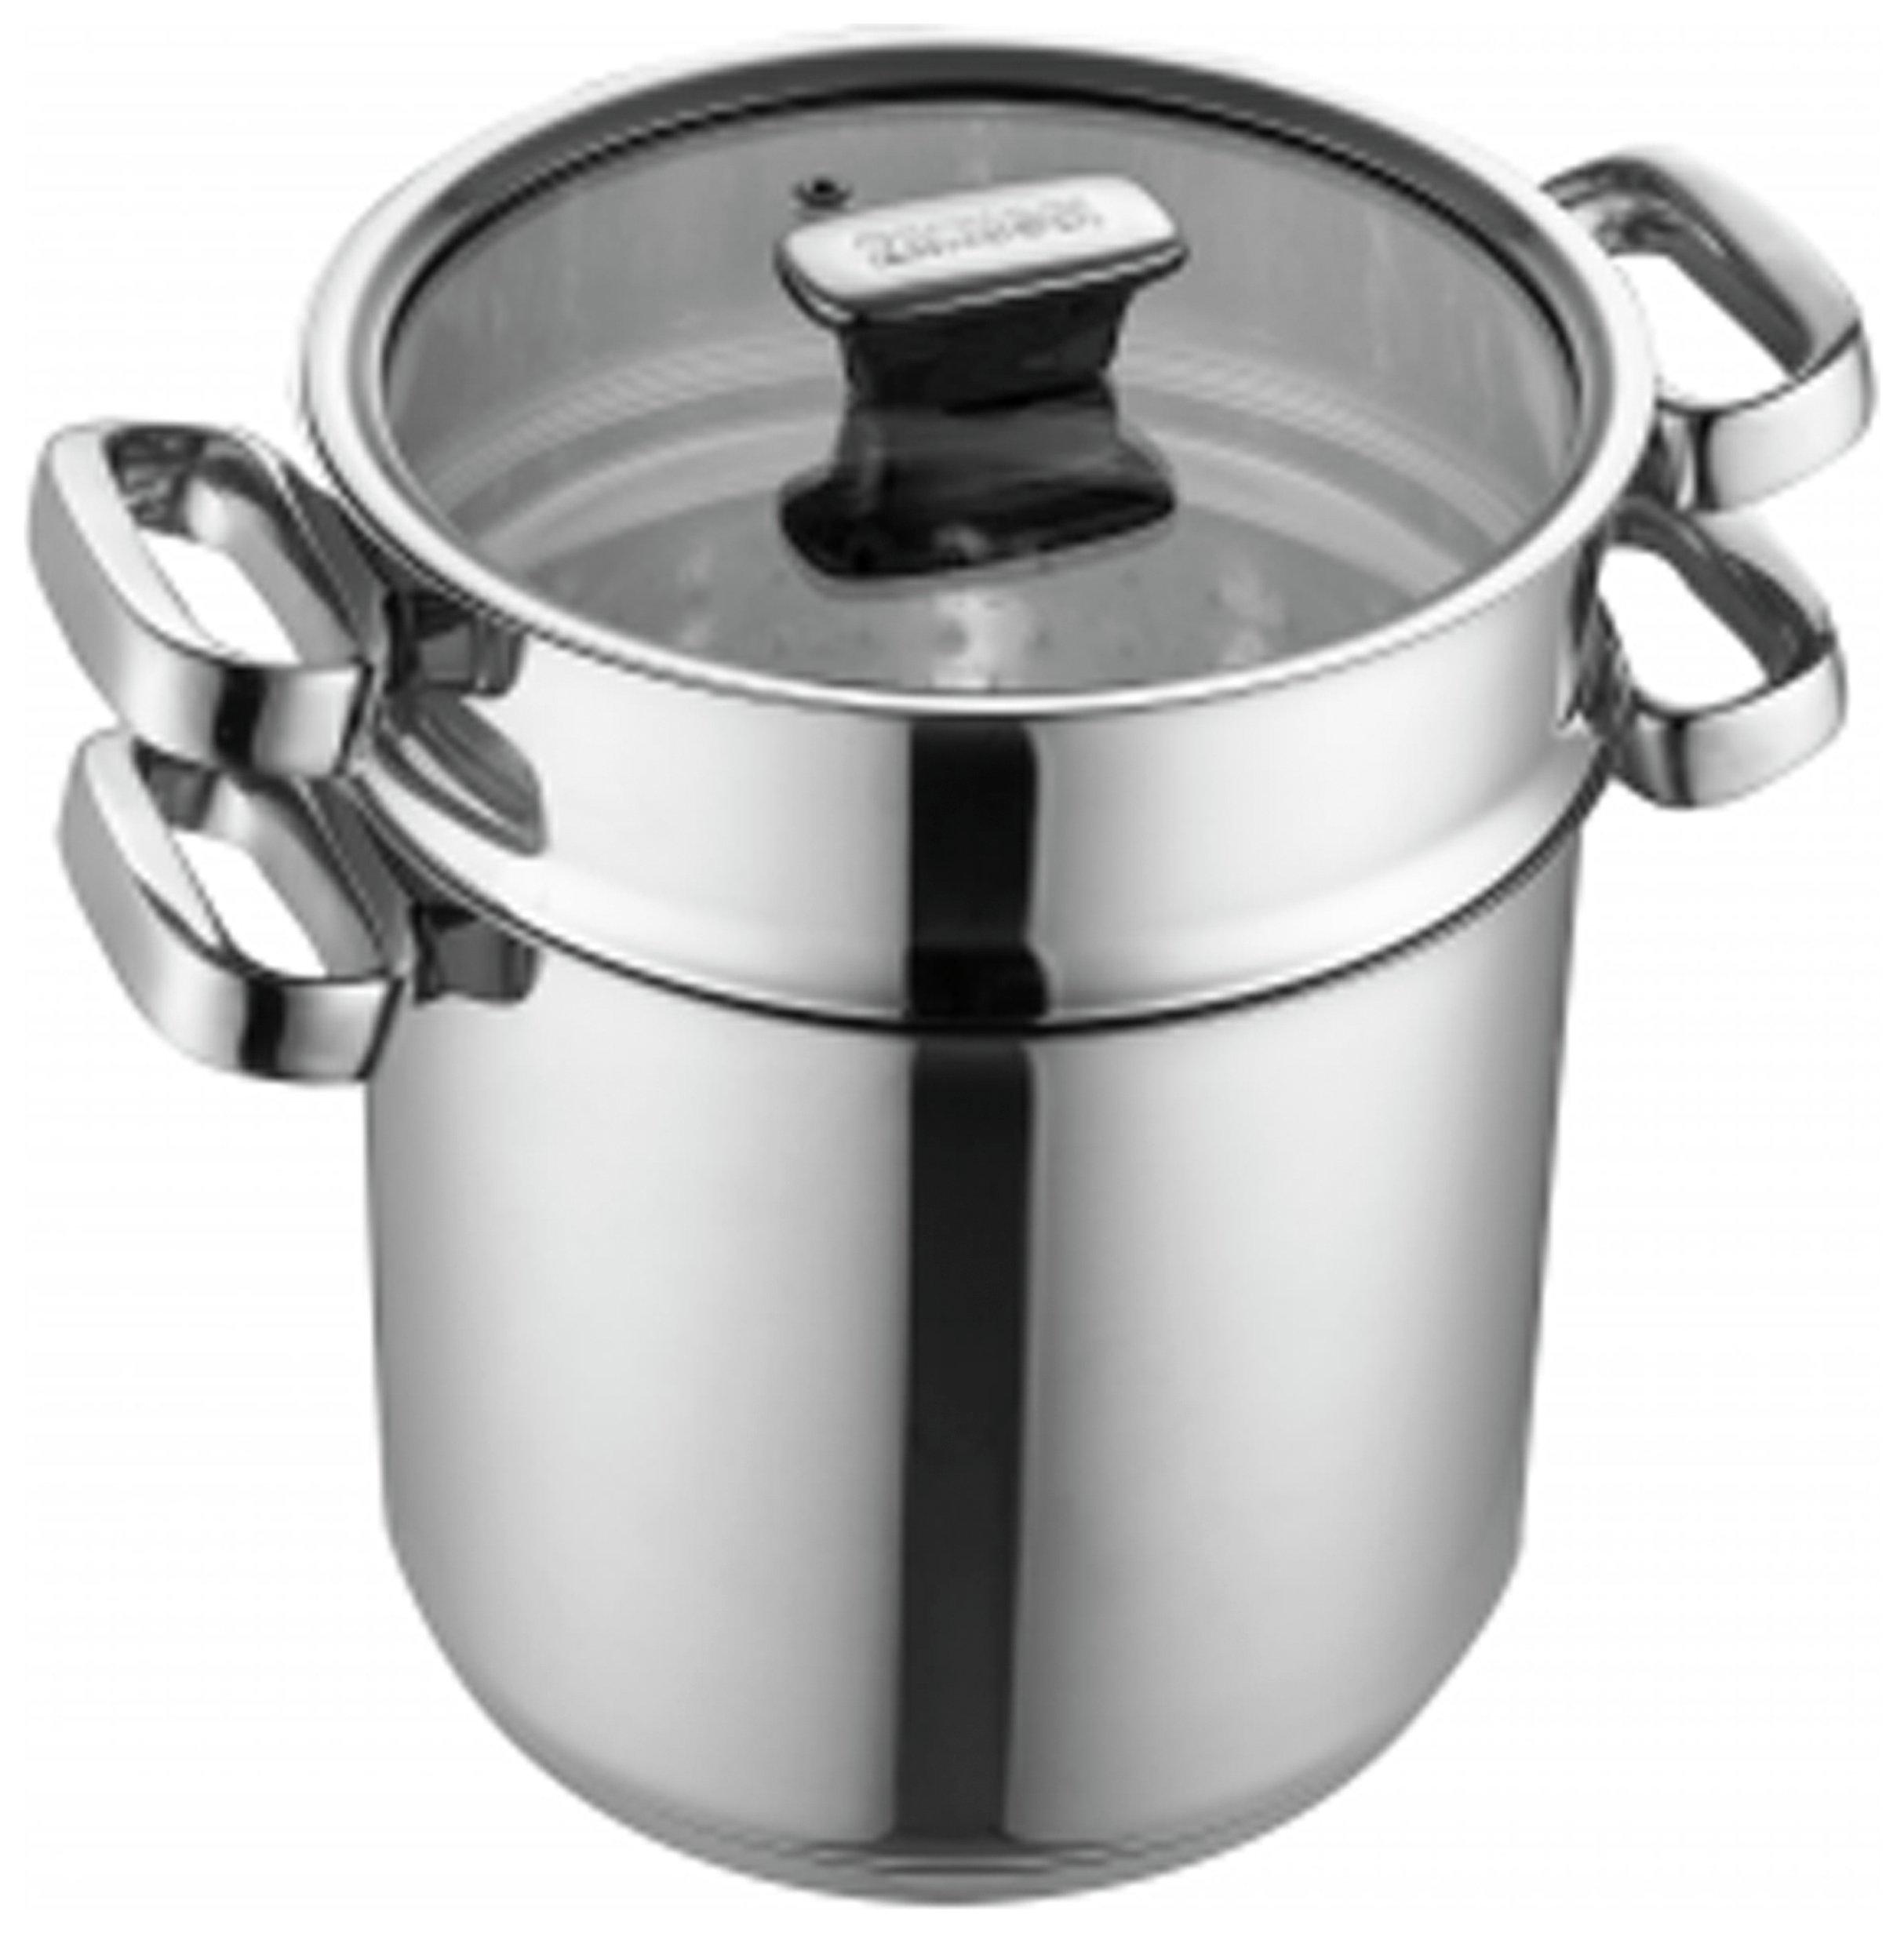 Zanussi Positano 20cm Stainless Steel Pasta Pot with Lid